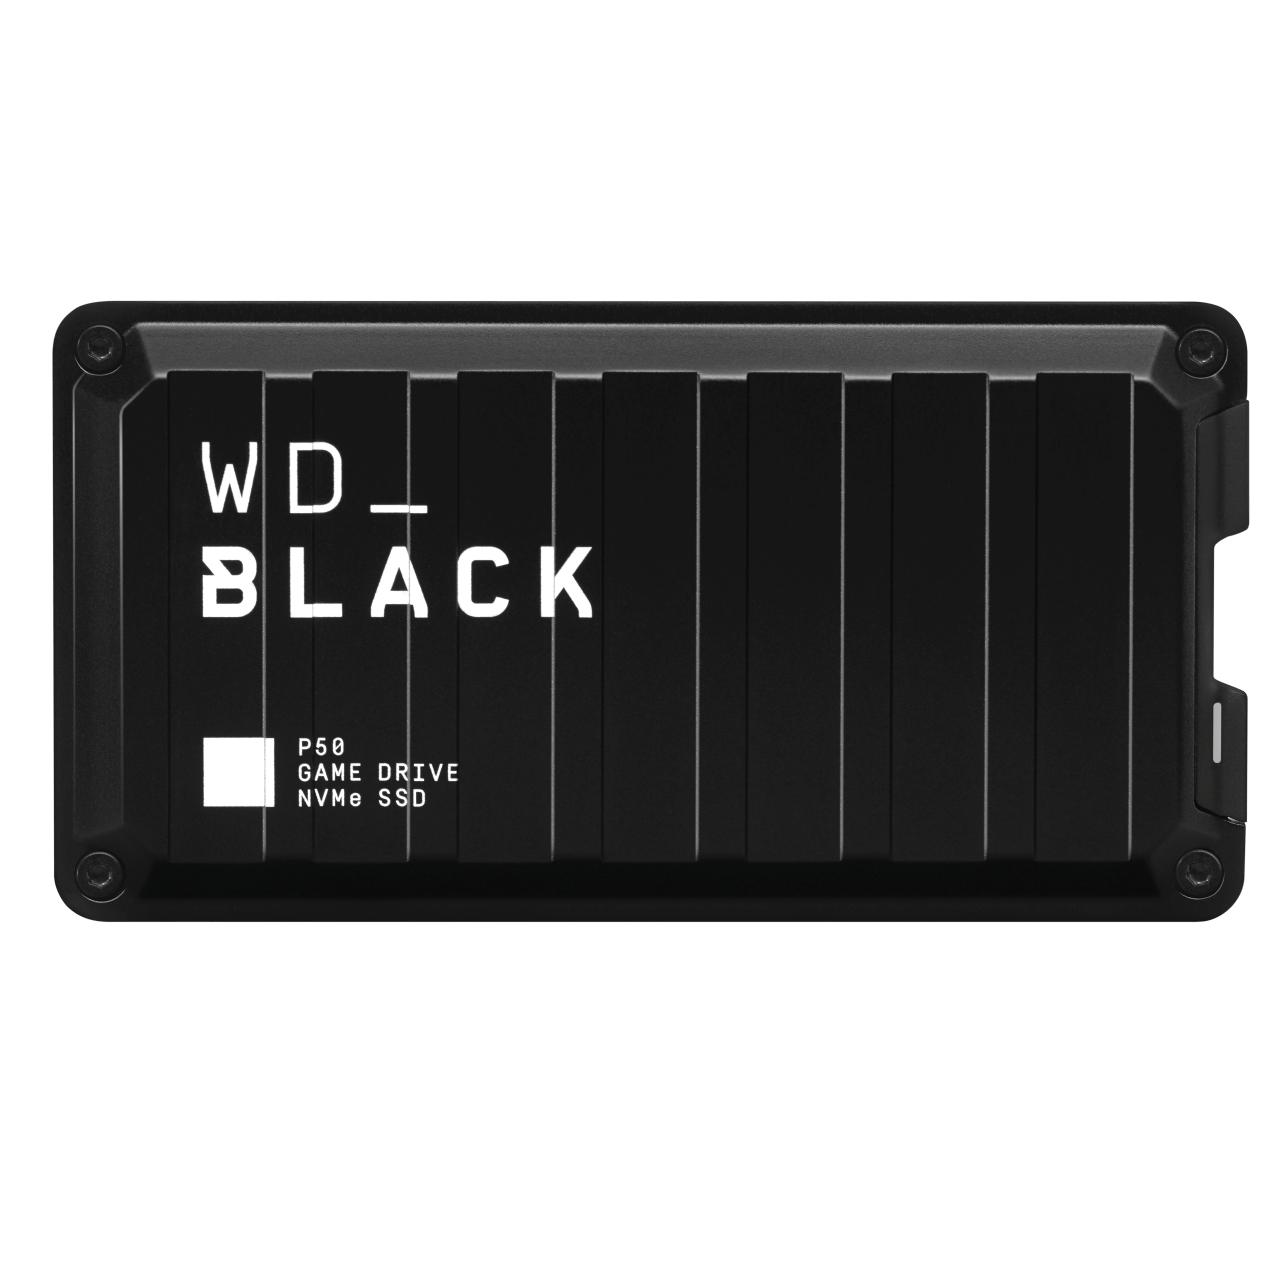 WD_BLACK P50 Game Drive SSD 2TB @ Western Digital Store